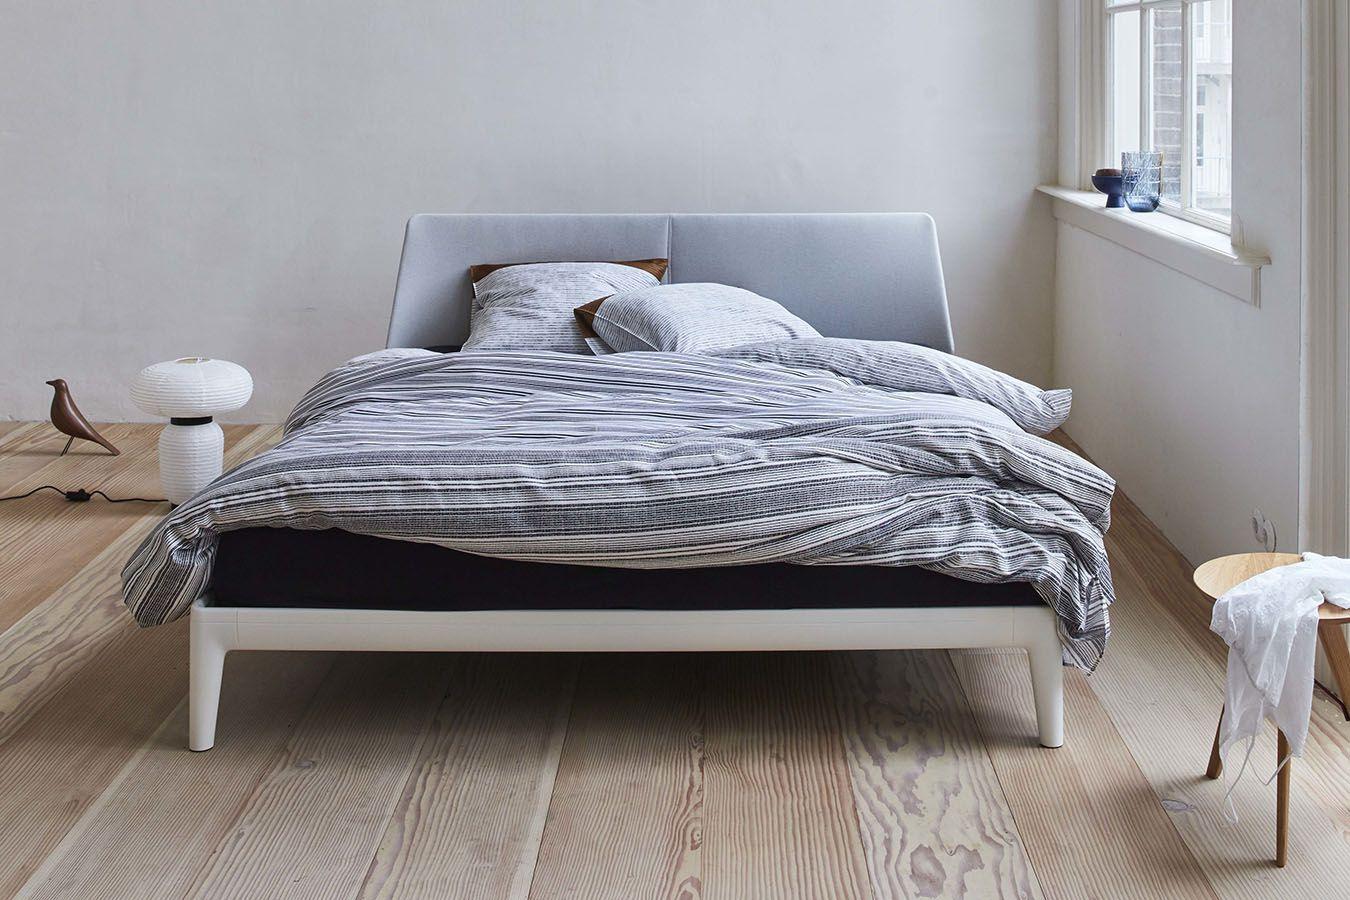 Tweepersoonsbed Compleet Met Matras.Auping Essential Bed